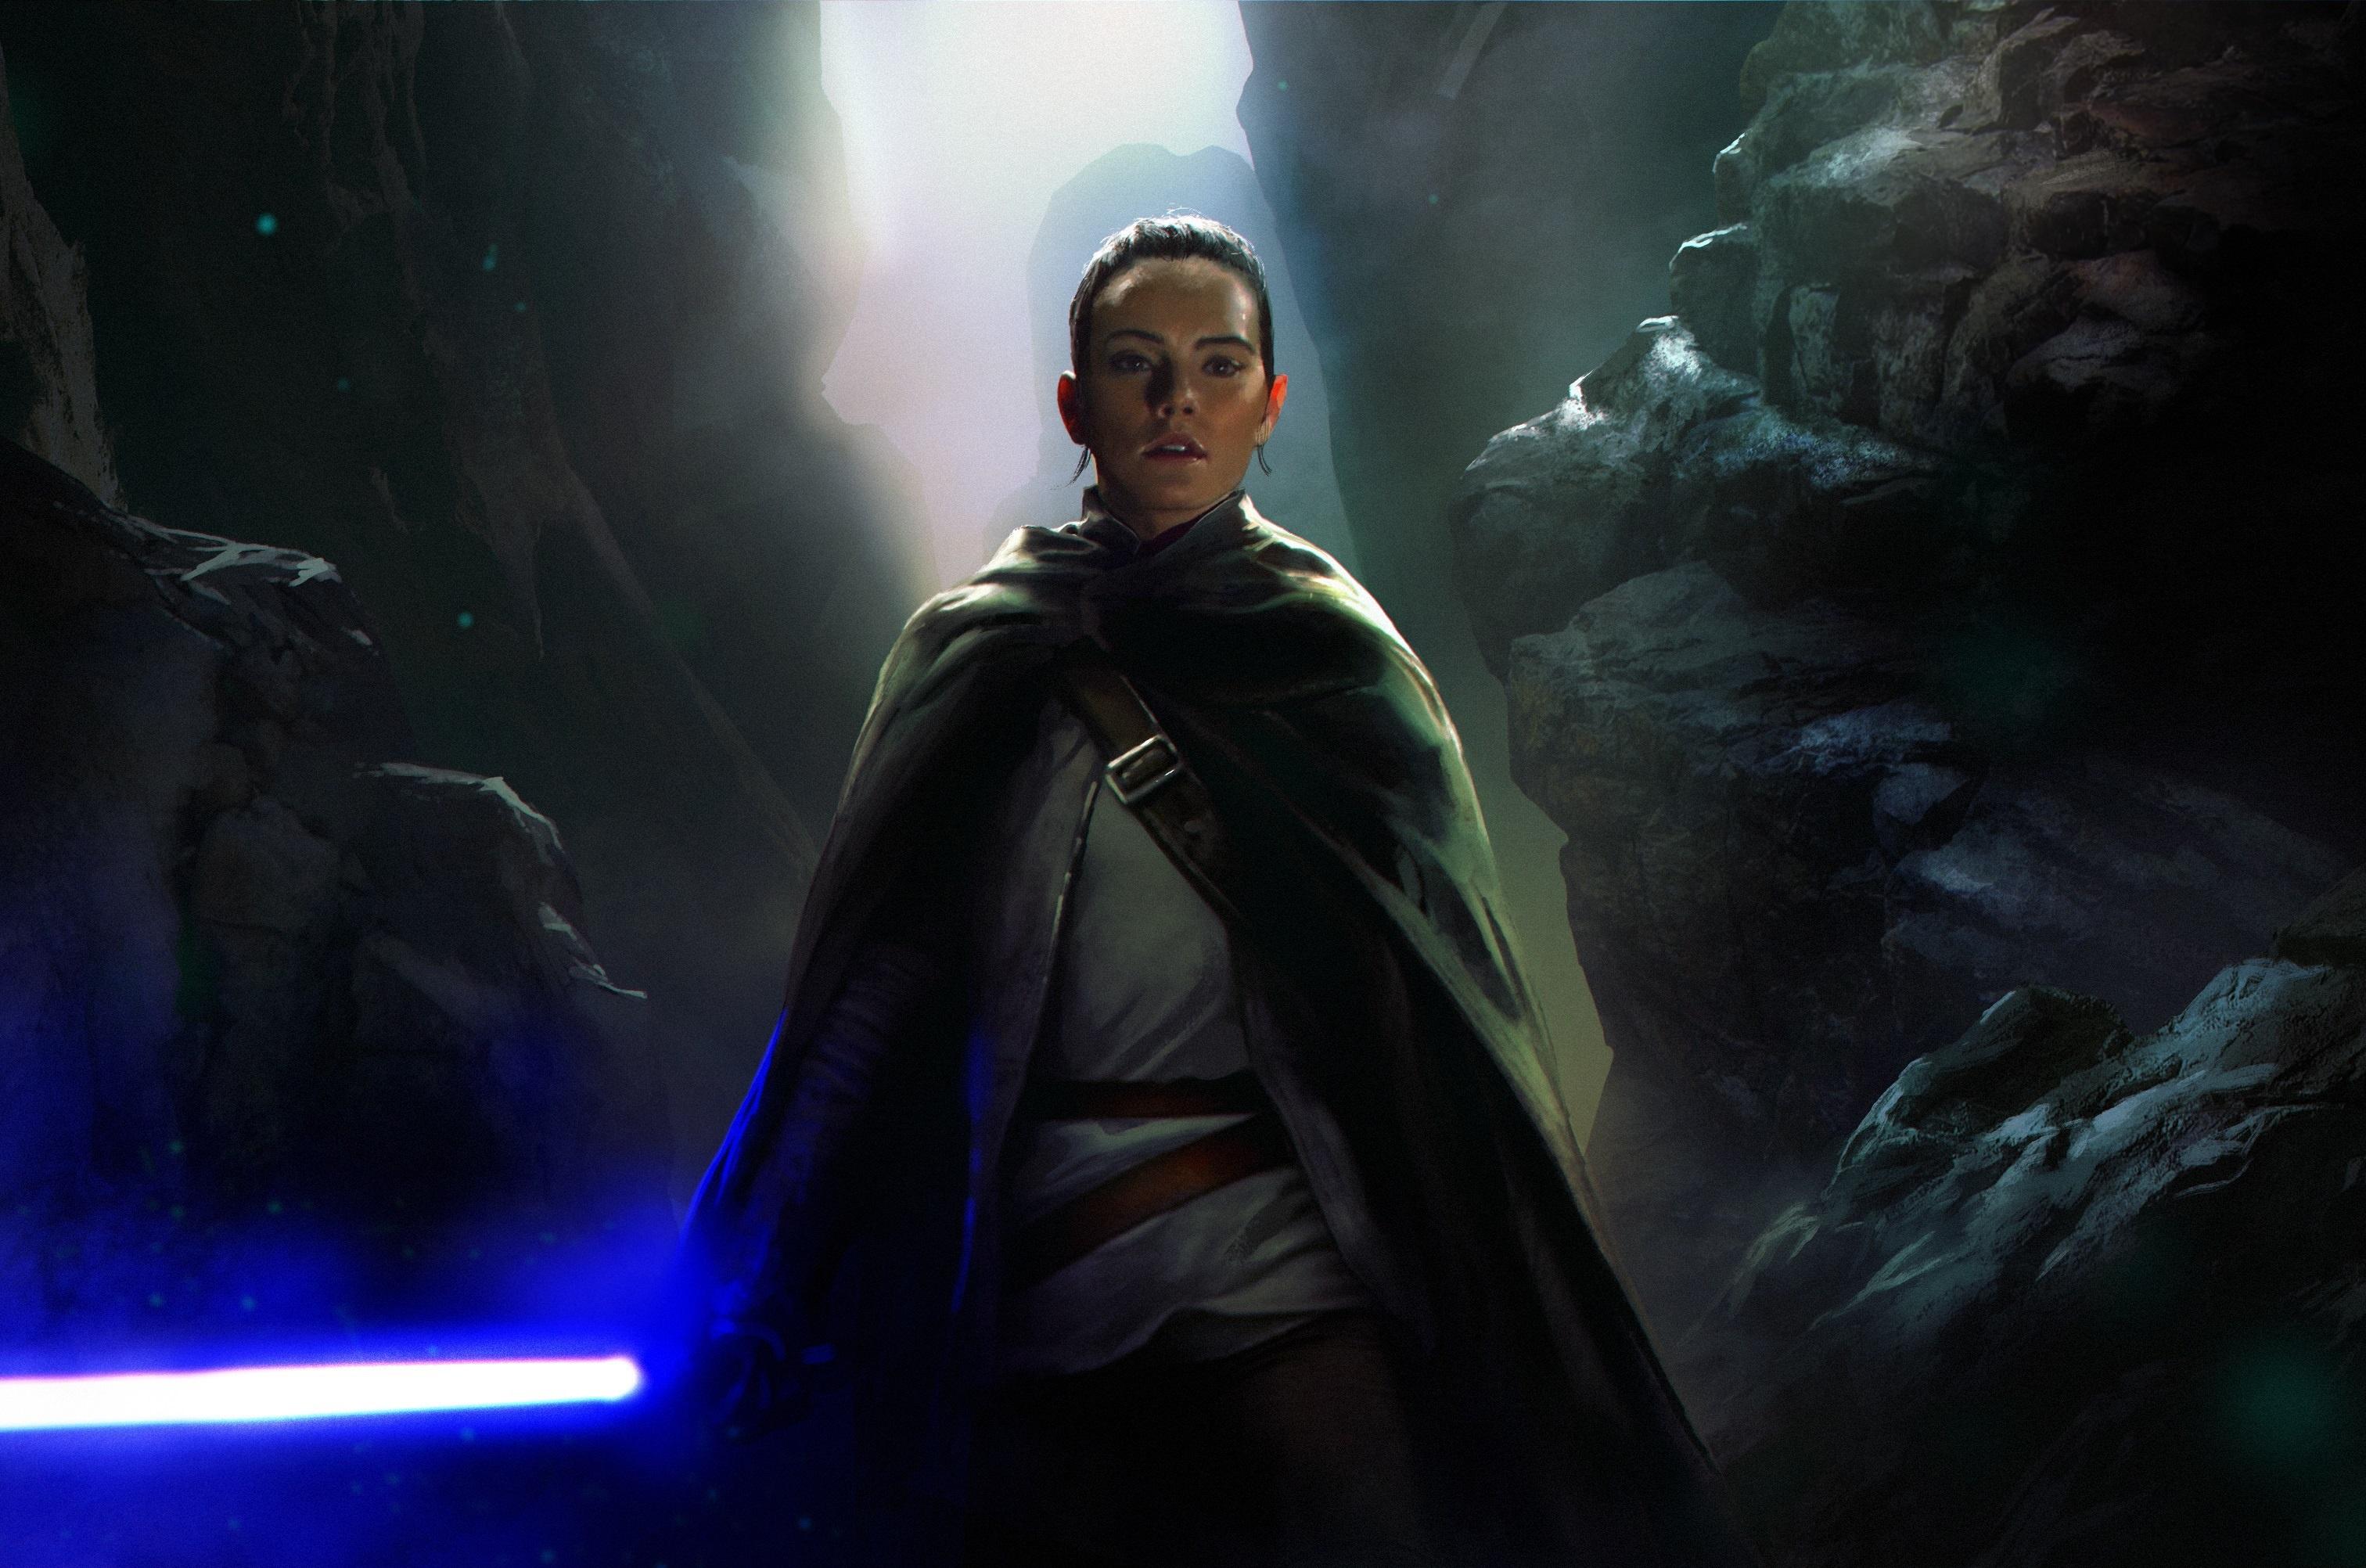 Dark Rey Star Wars Wallpapers Wallpaper Cave